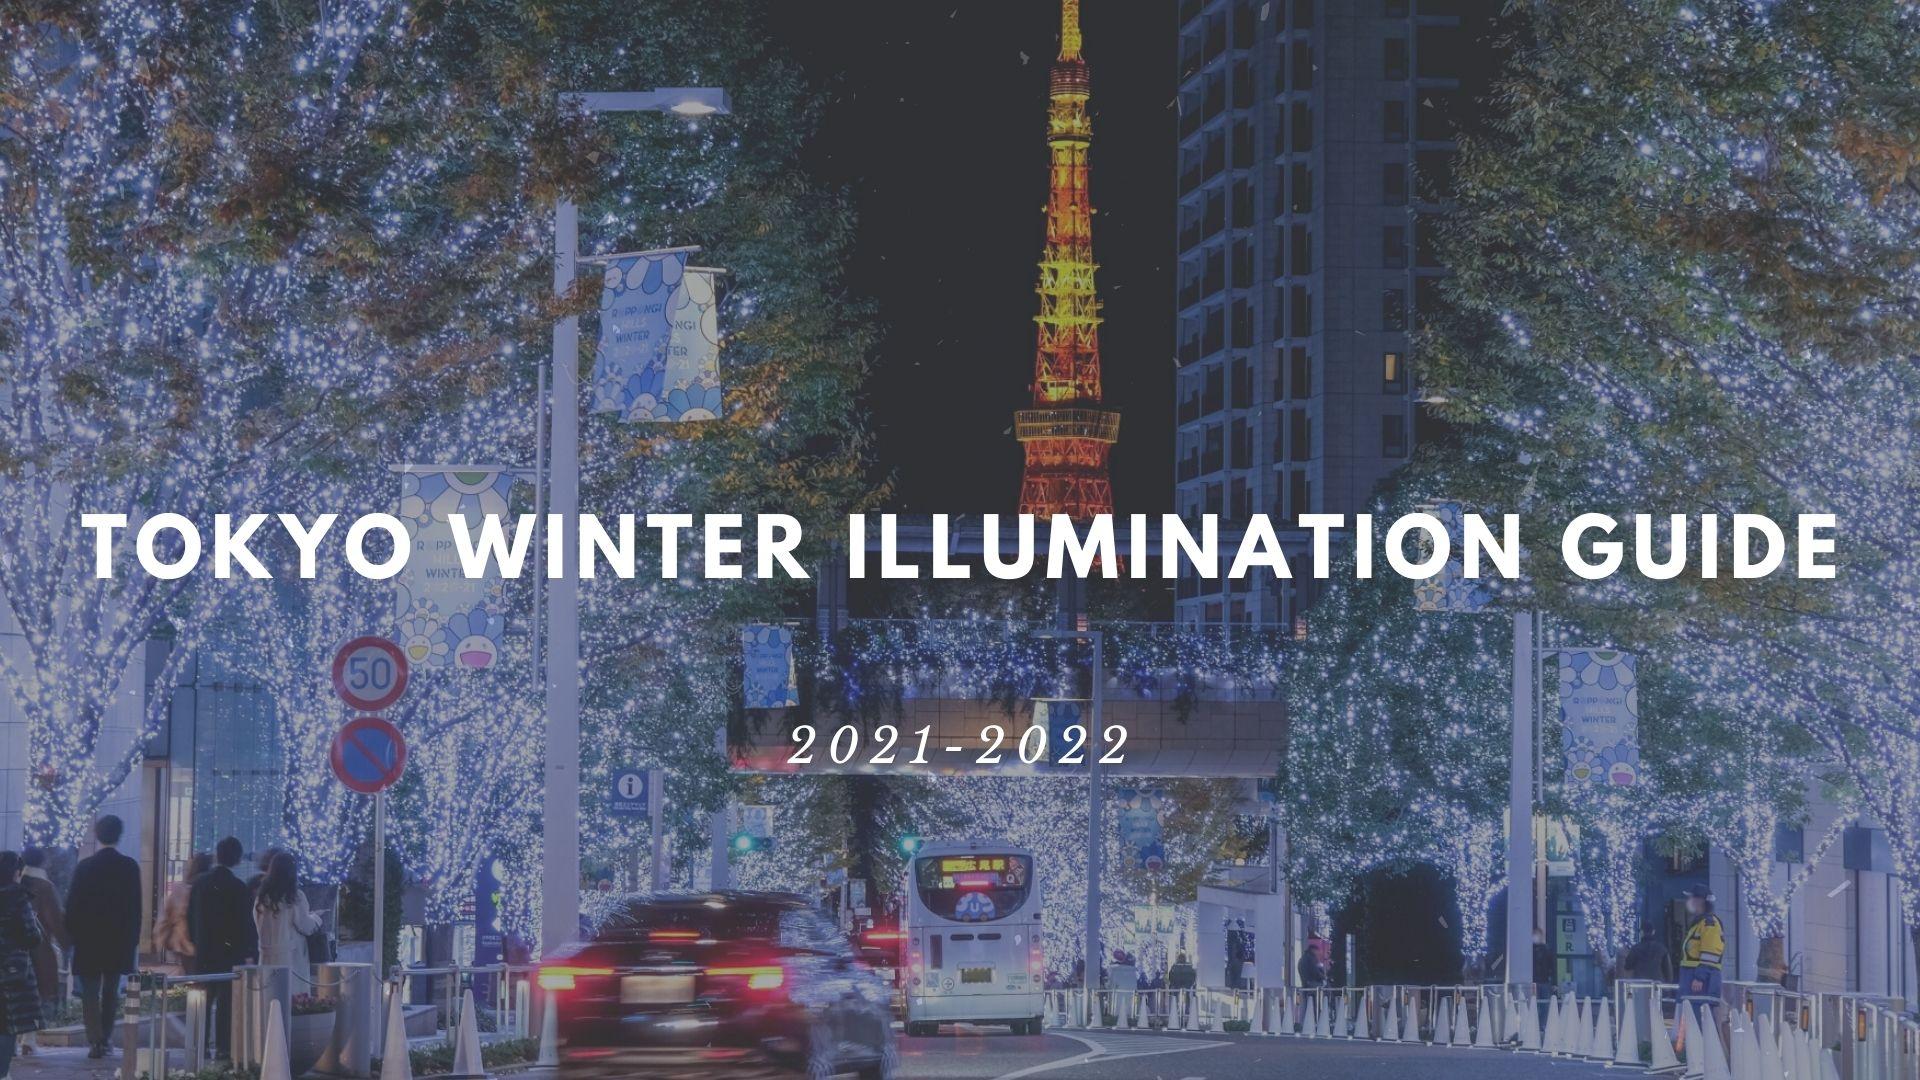 Tokyo Winter Illumination Guide 2021-2022